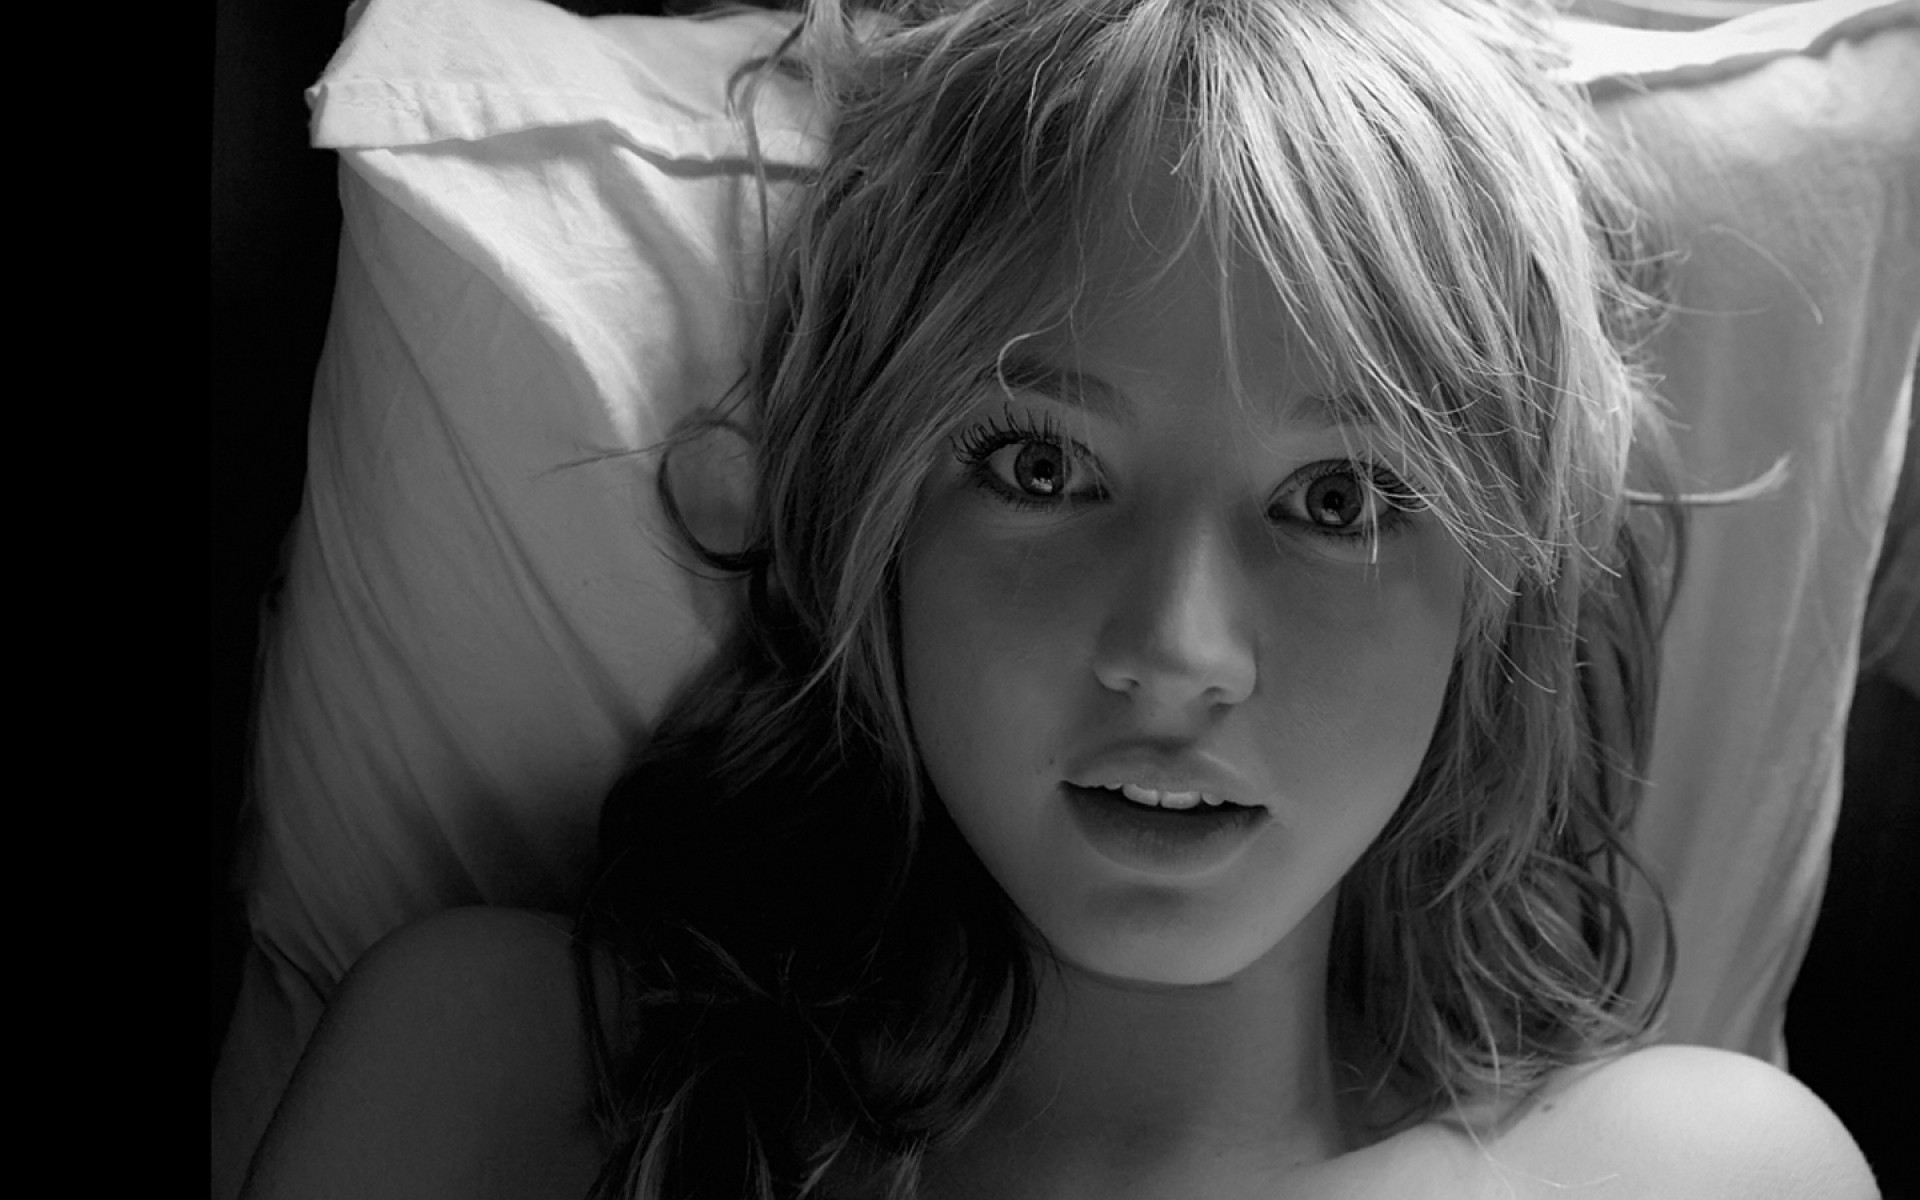 Interracial video young nude girls nylon